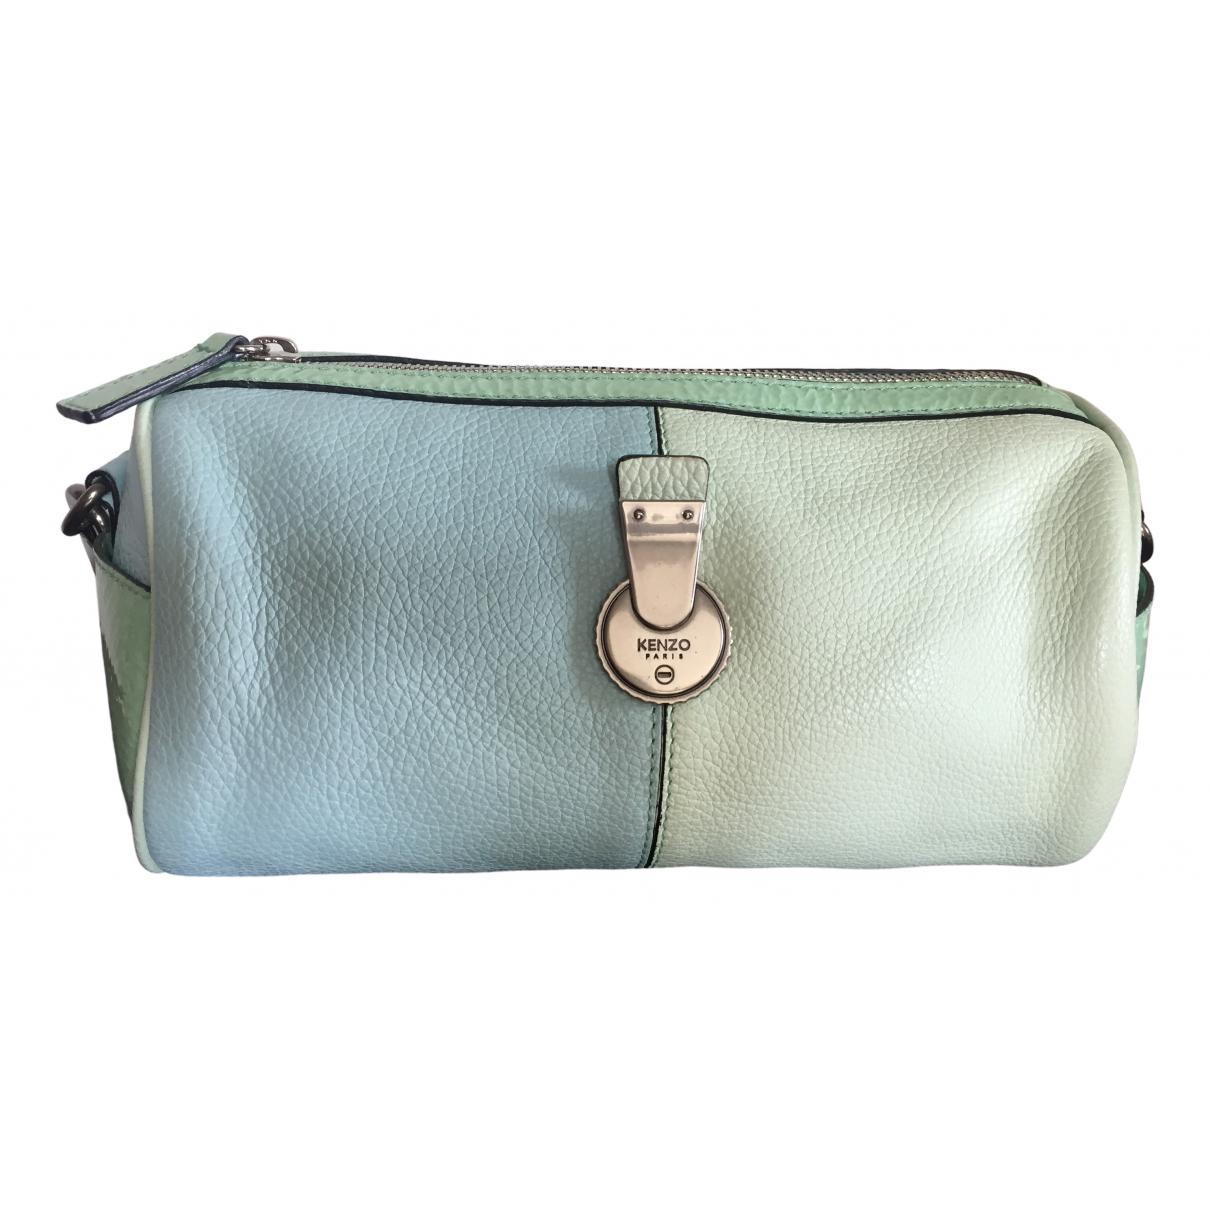 Kenzo \N Turquoise Leather handbag for Women \N